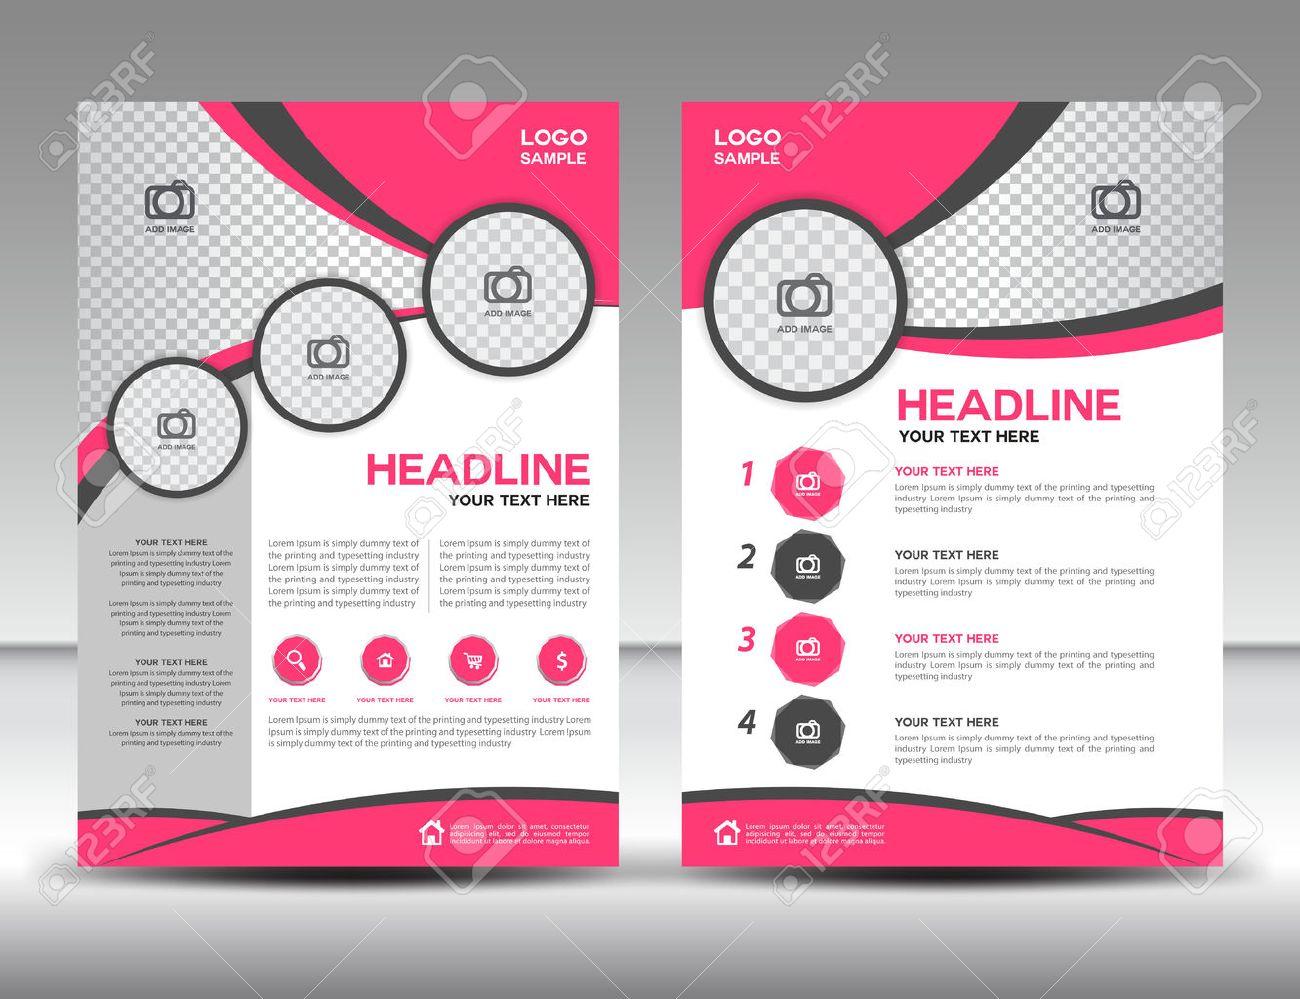 pink business brochure flyer design layout template in a4 size pink business brochure flyer design layout template in a4 size cover annual report